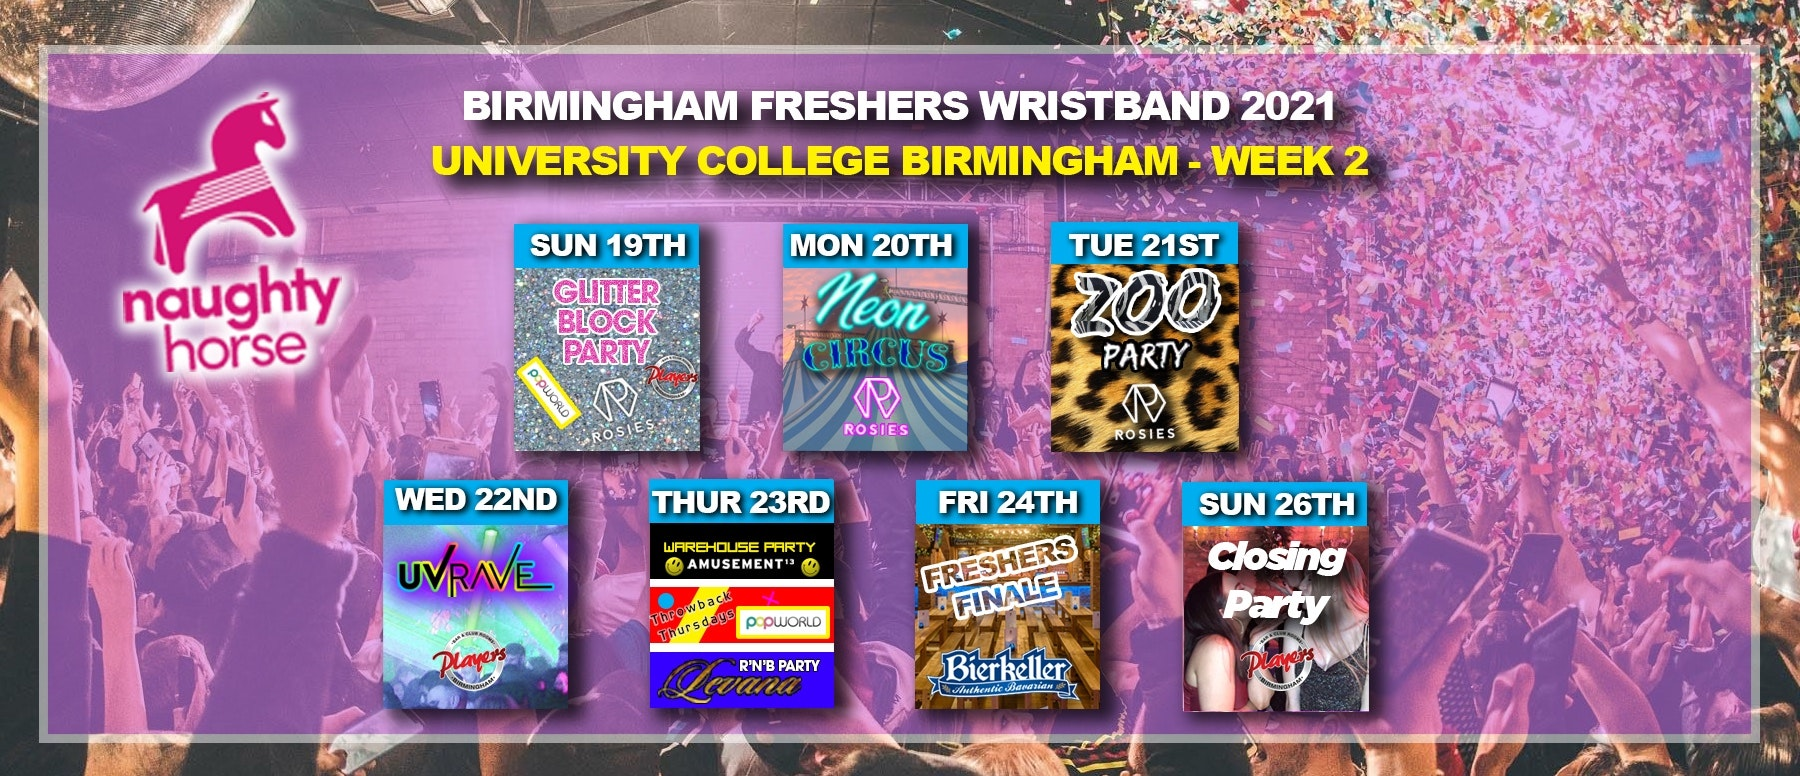 Birmingham Freshers Wristband 2021 – University College Birmingham (UCB) WEEK 2!